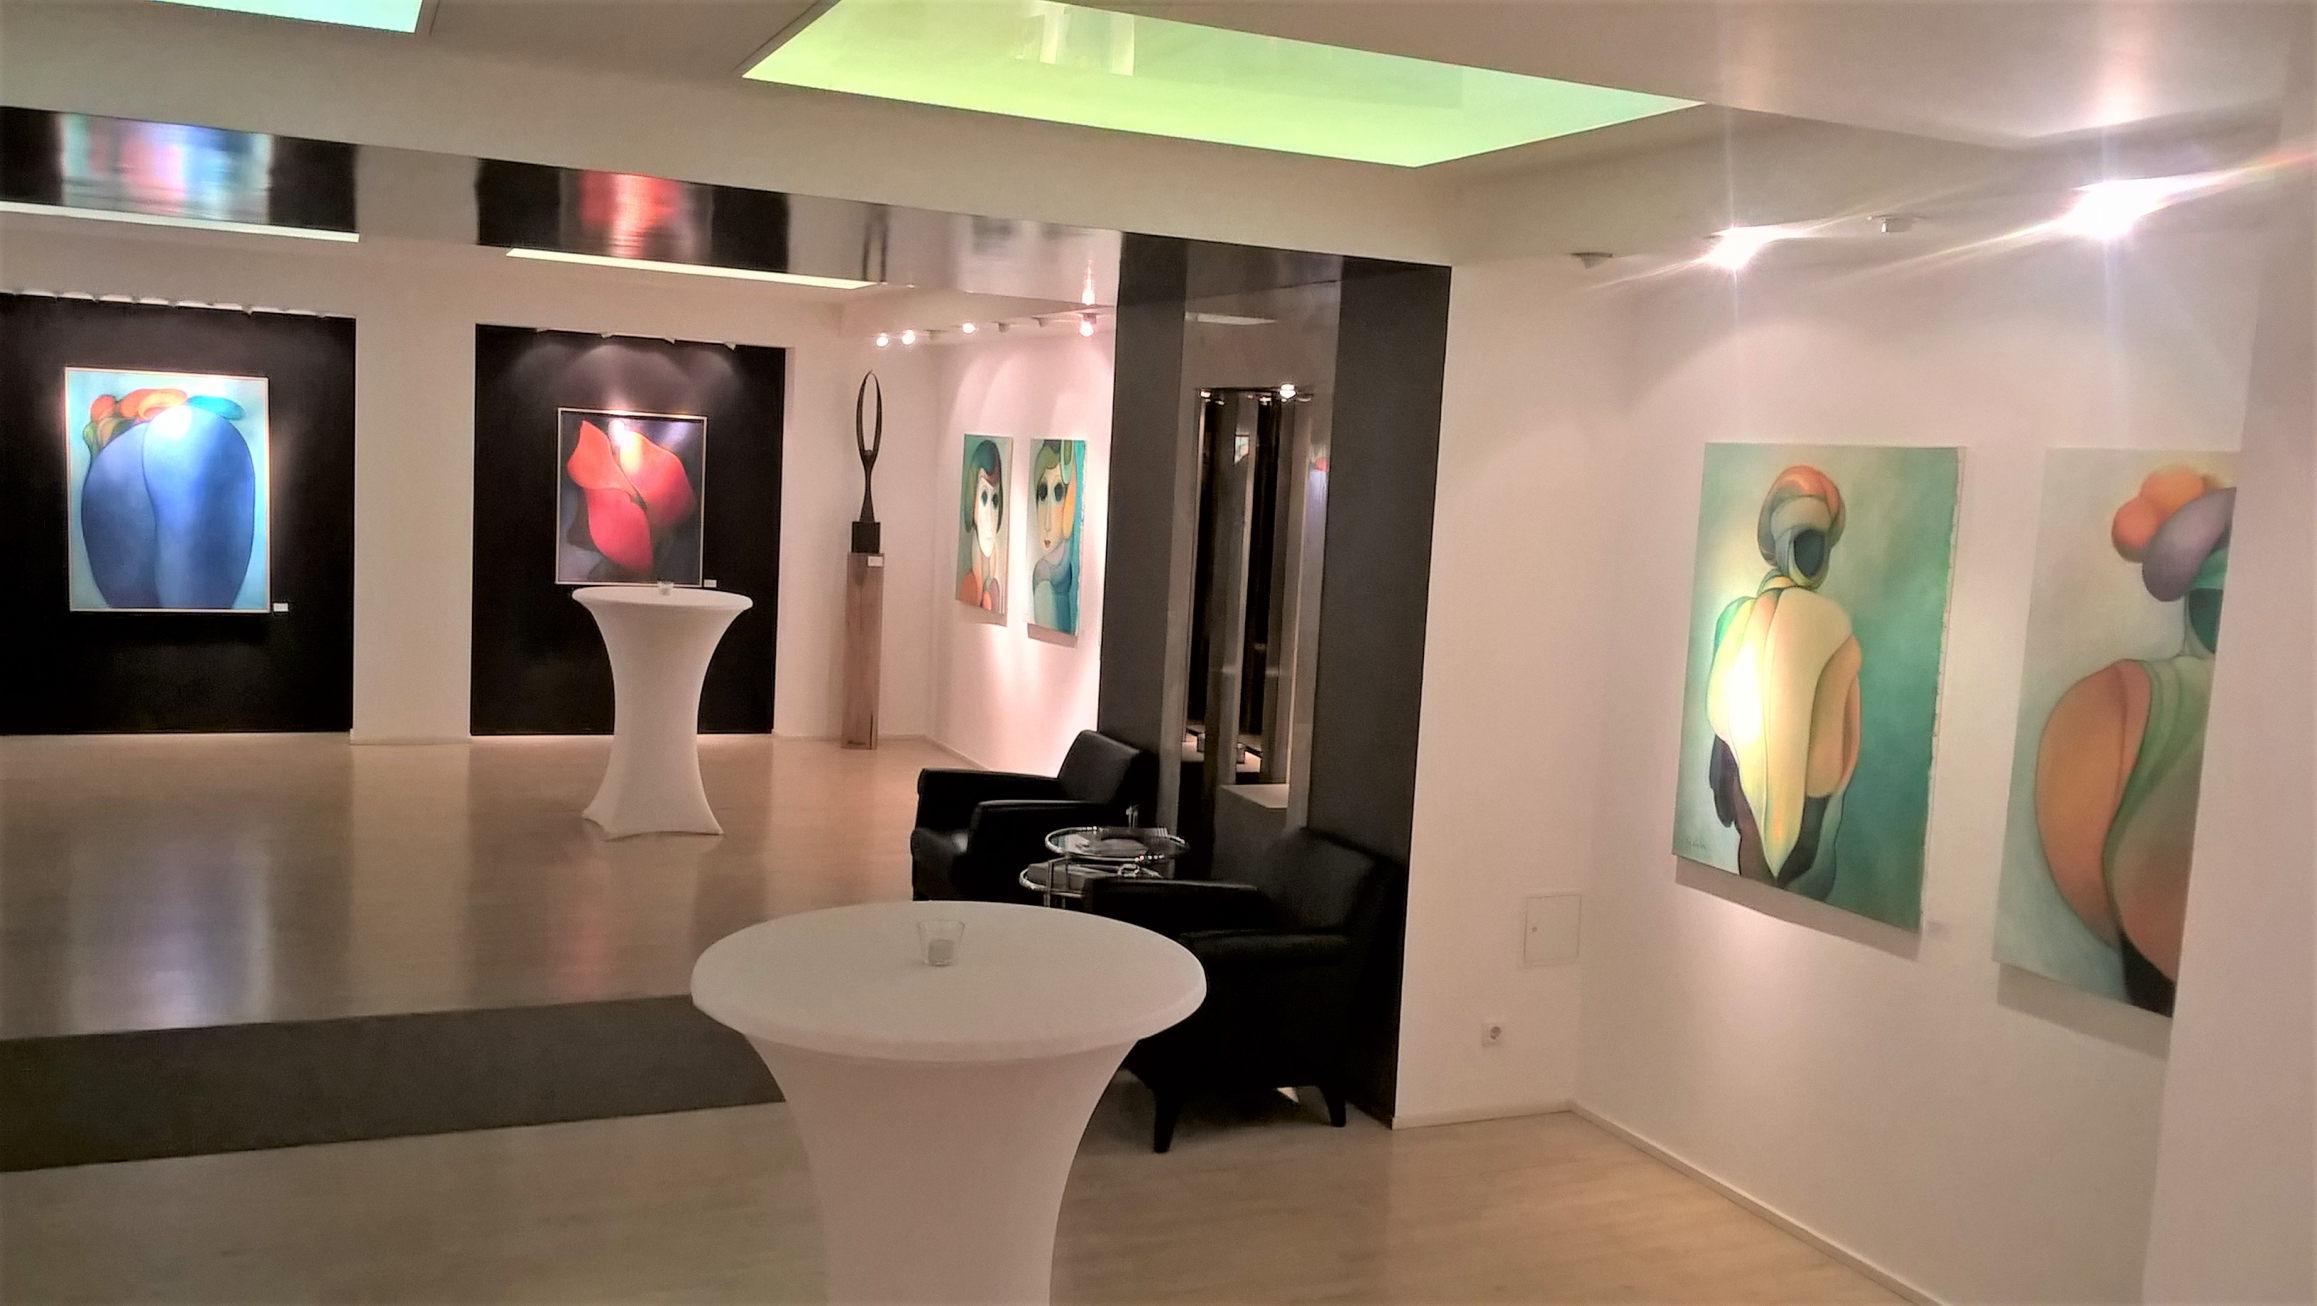 Reinhard Gäde Galerie Baumgartl Ausstellung 2017 7.jpg